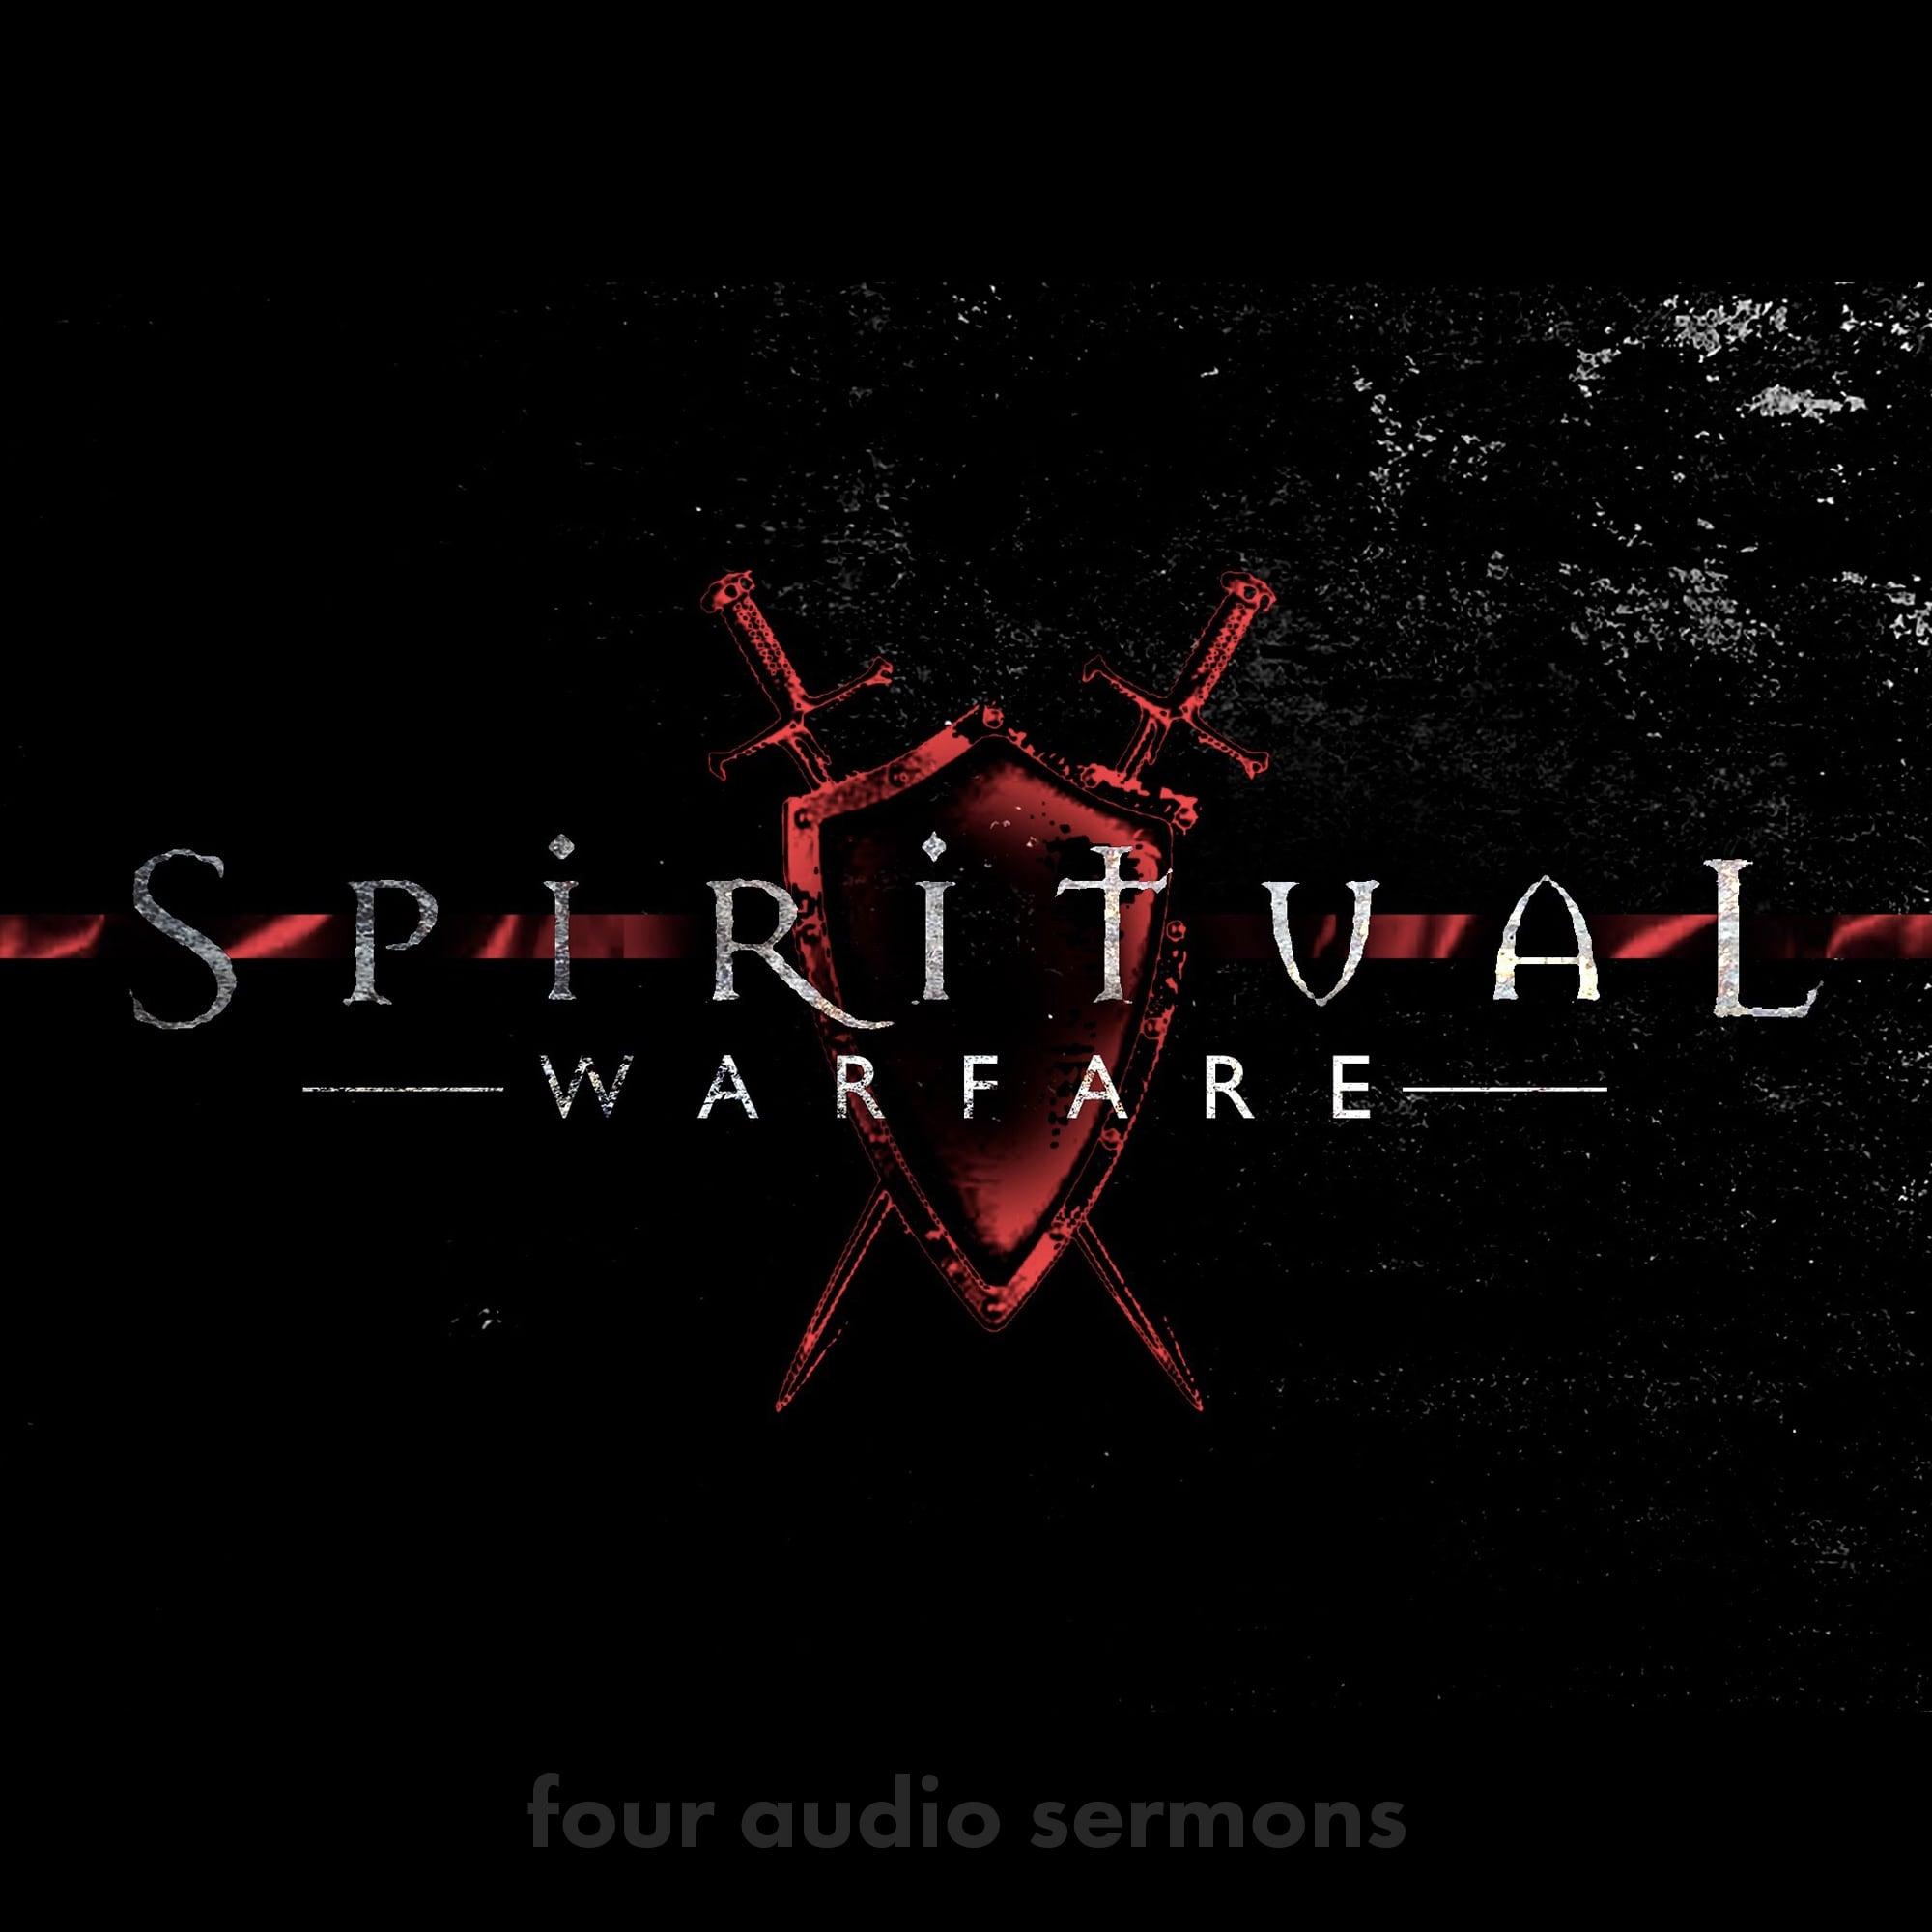 Series: Spiritual Warfare